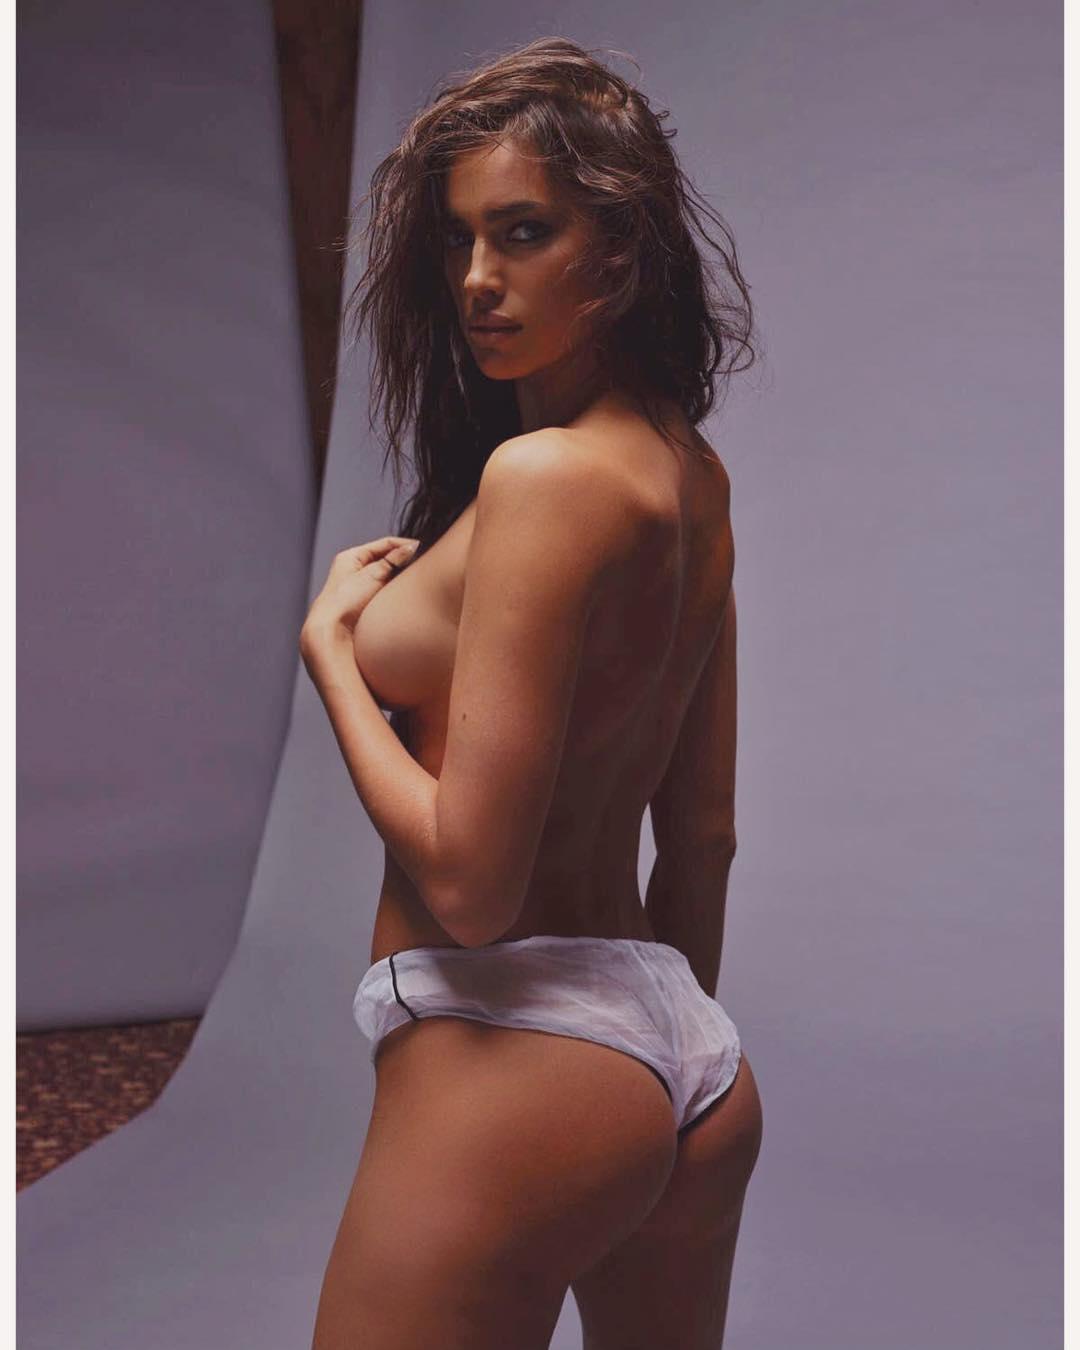 shayk topless